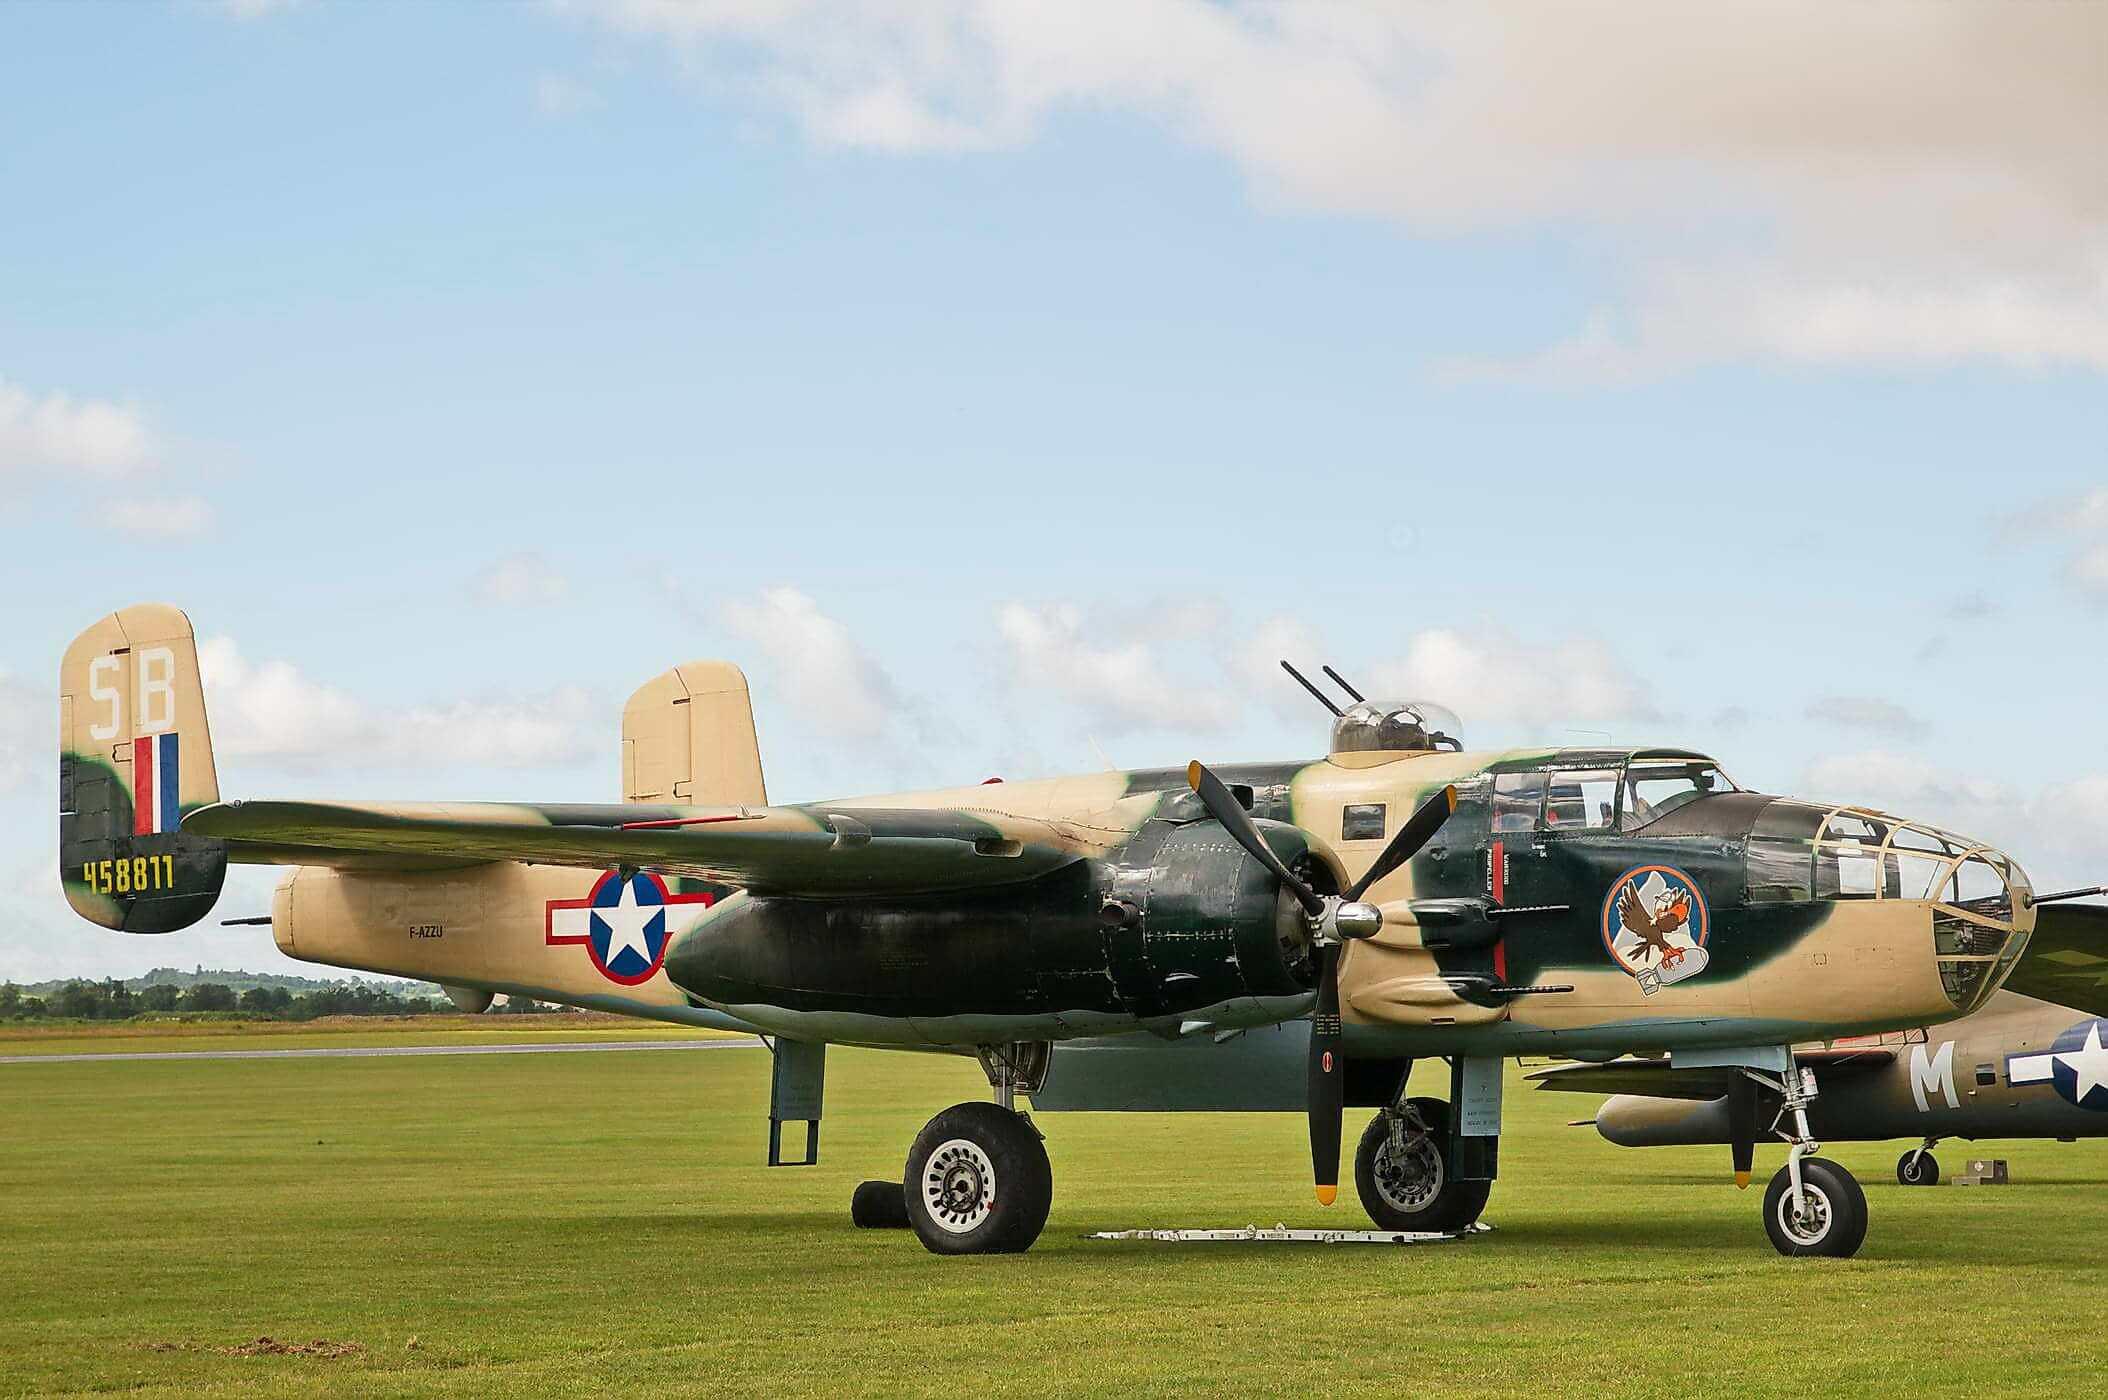 North Ameican Mitchell B-25-J35 - 45-8811